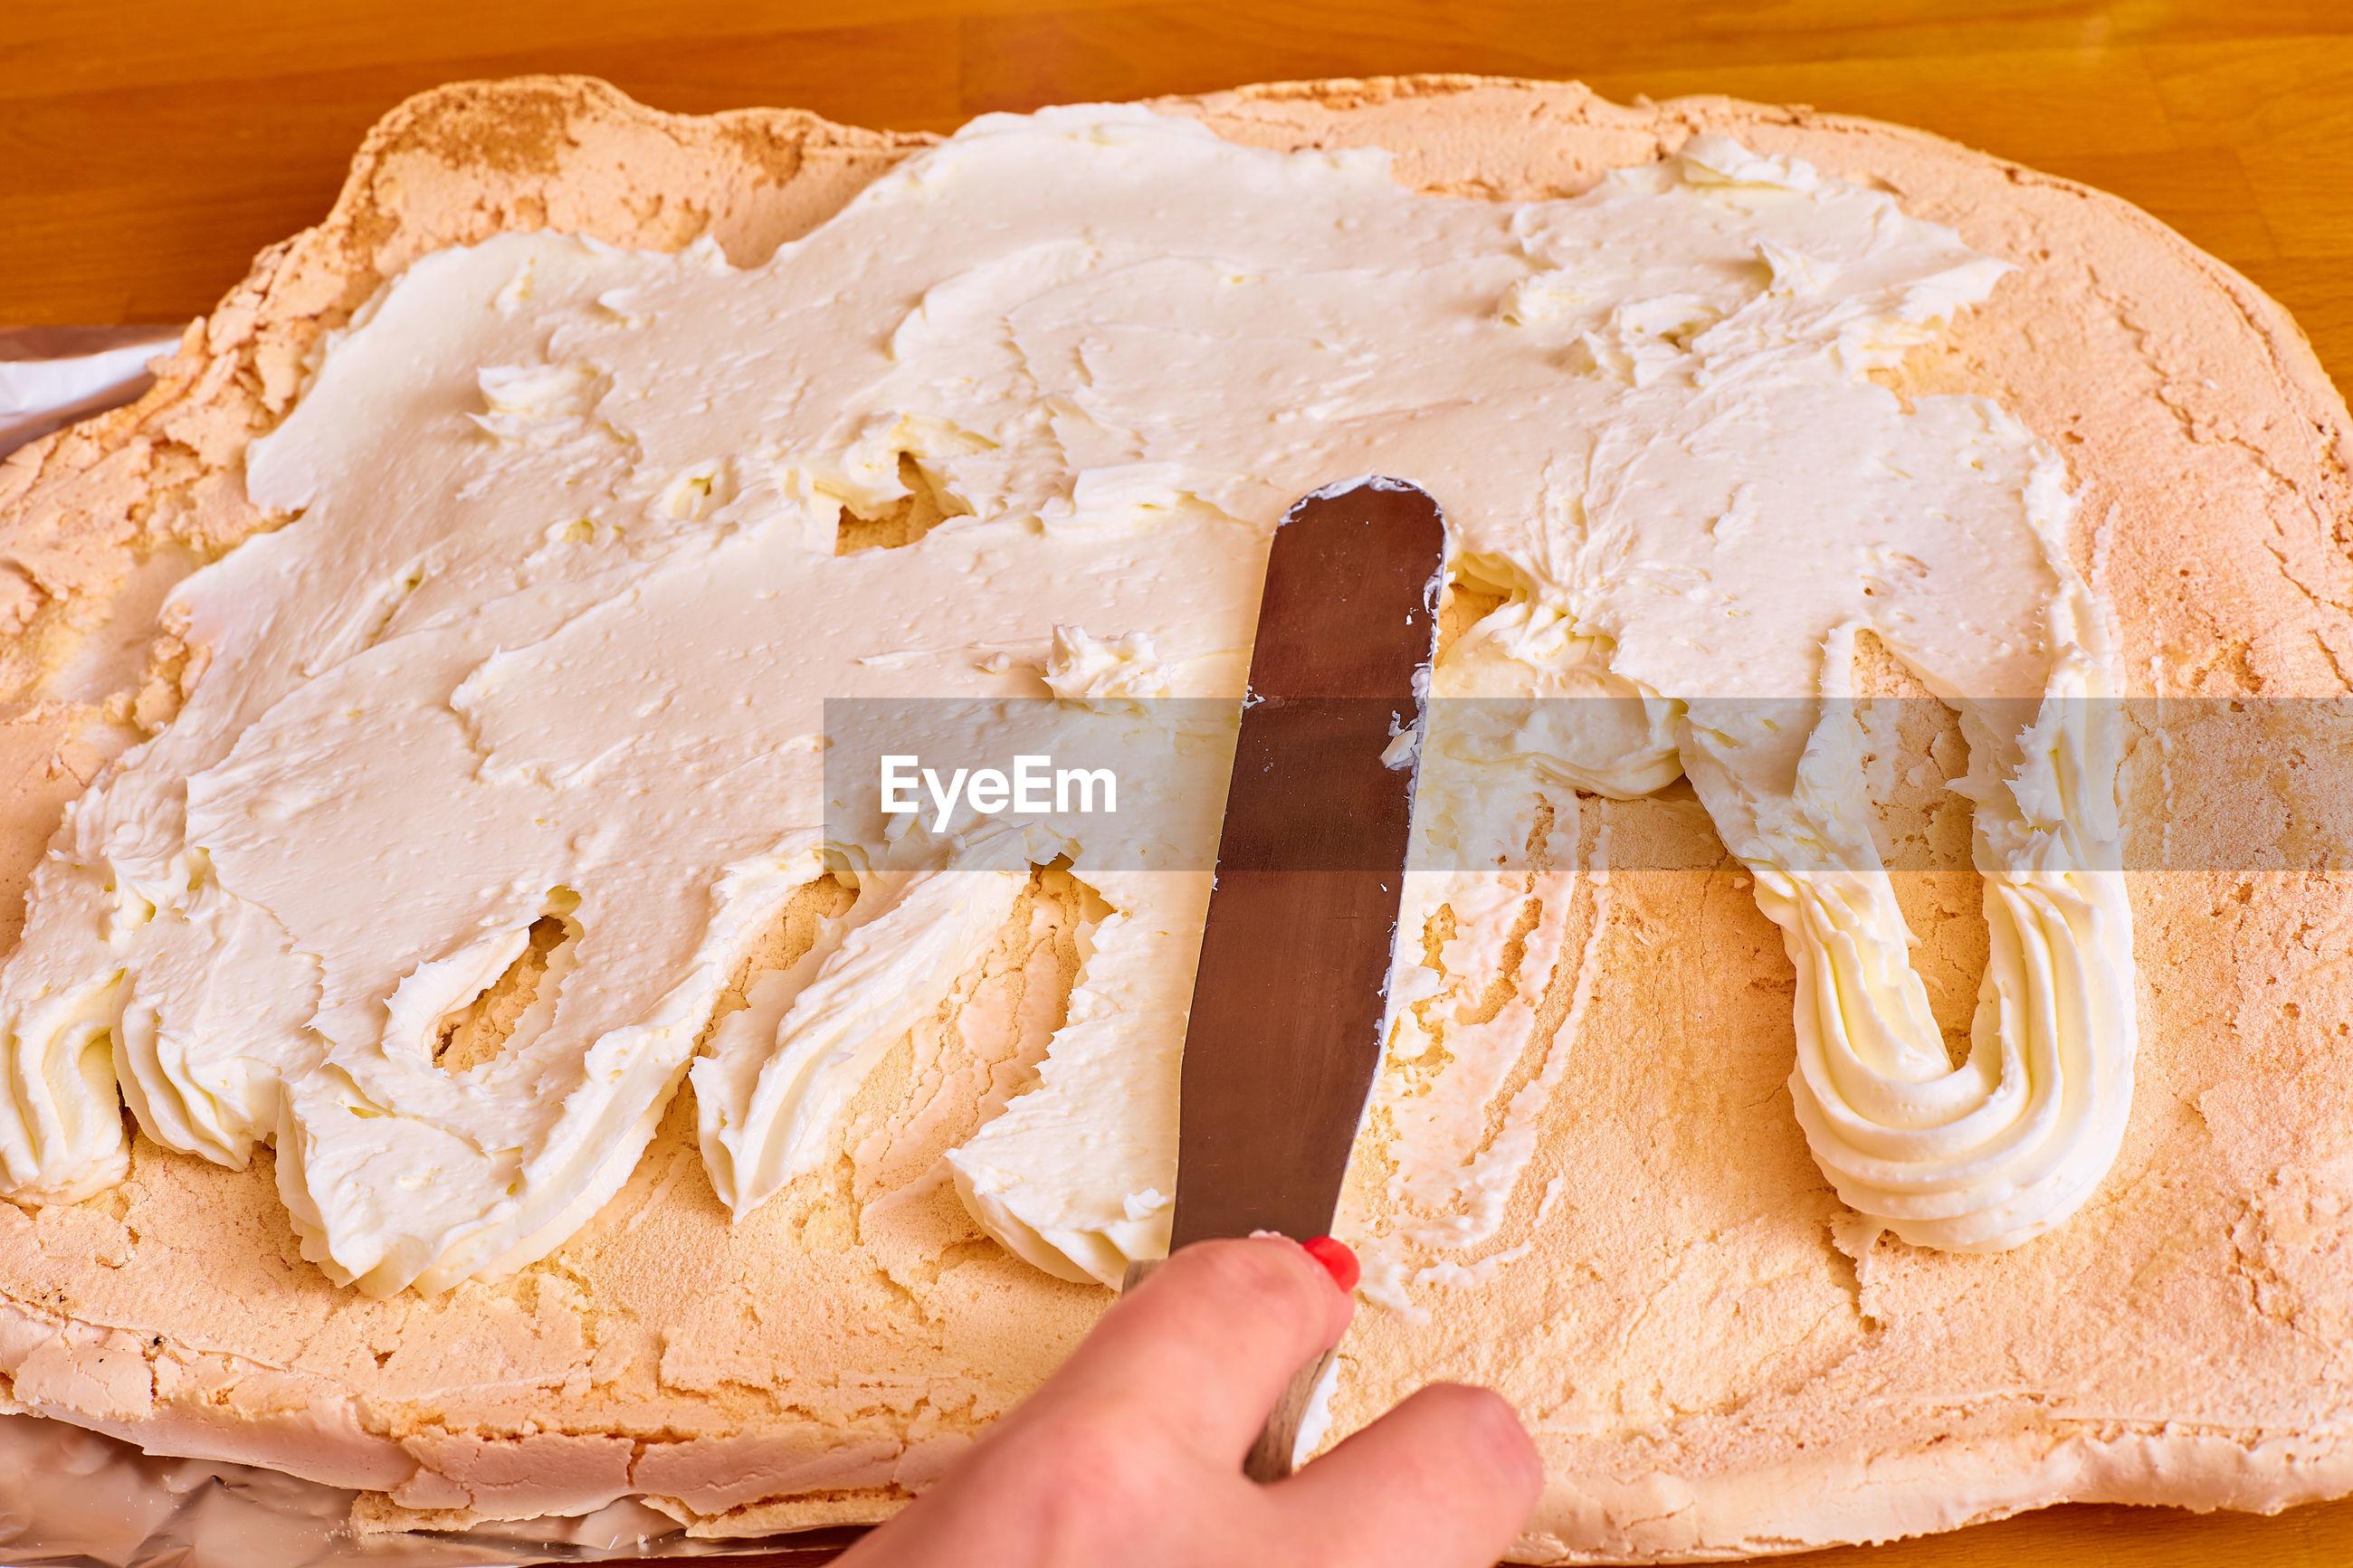 HIGH ANGLE VIEW OF HAND HOLDING CHOCOLATE CAKE